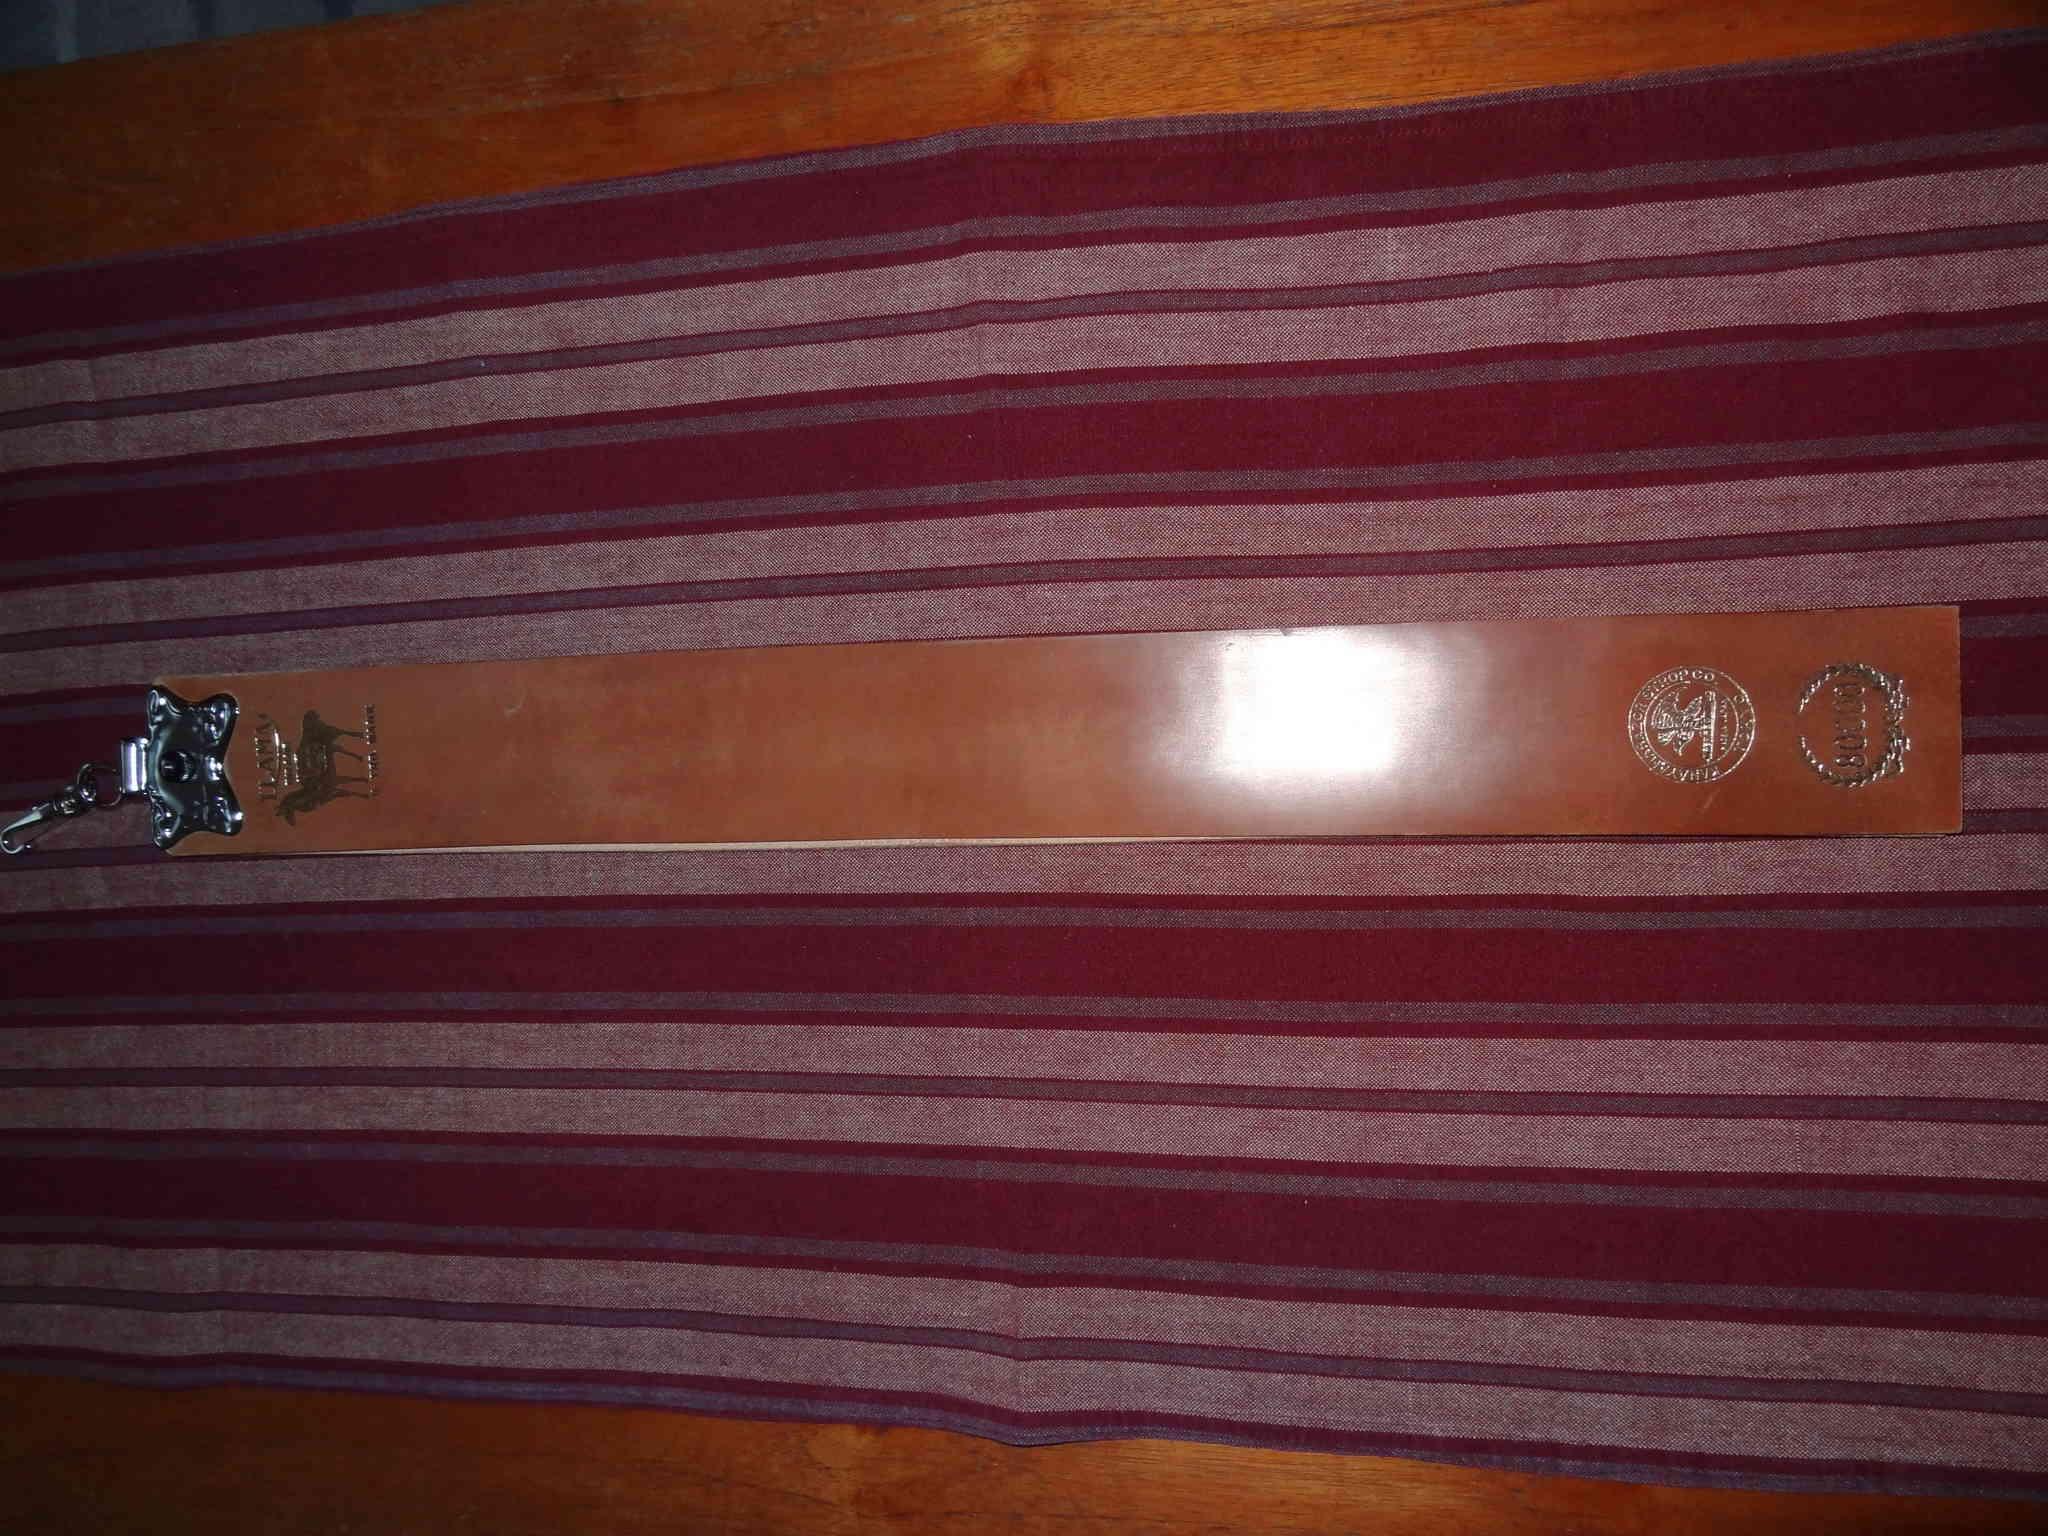 strop en cuir de cheval végétal Dsc01430